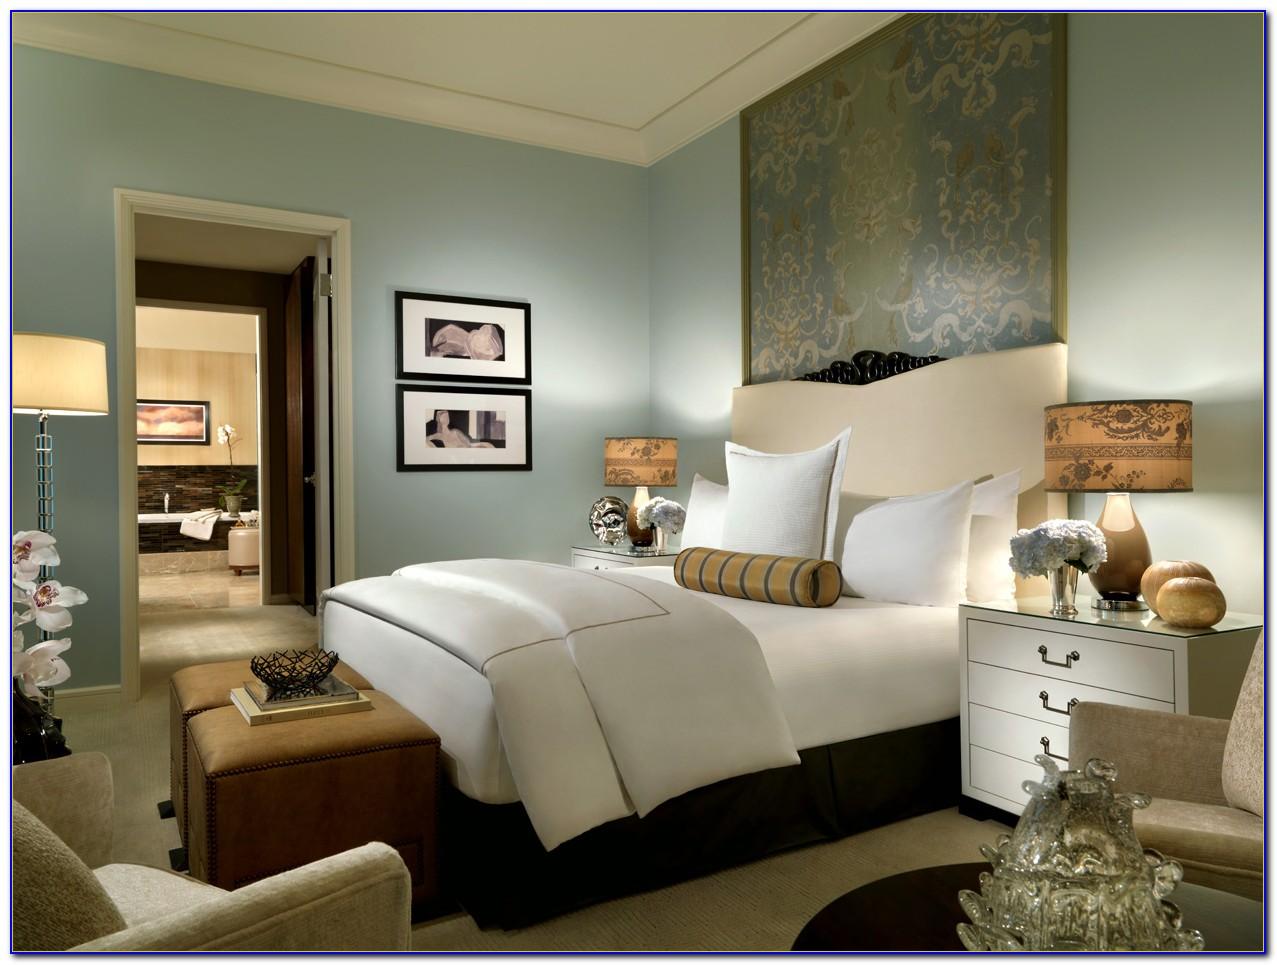 2 Bedroom Hotels Las Vegas Nv